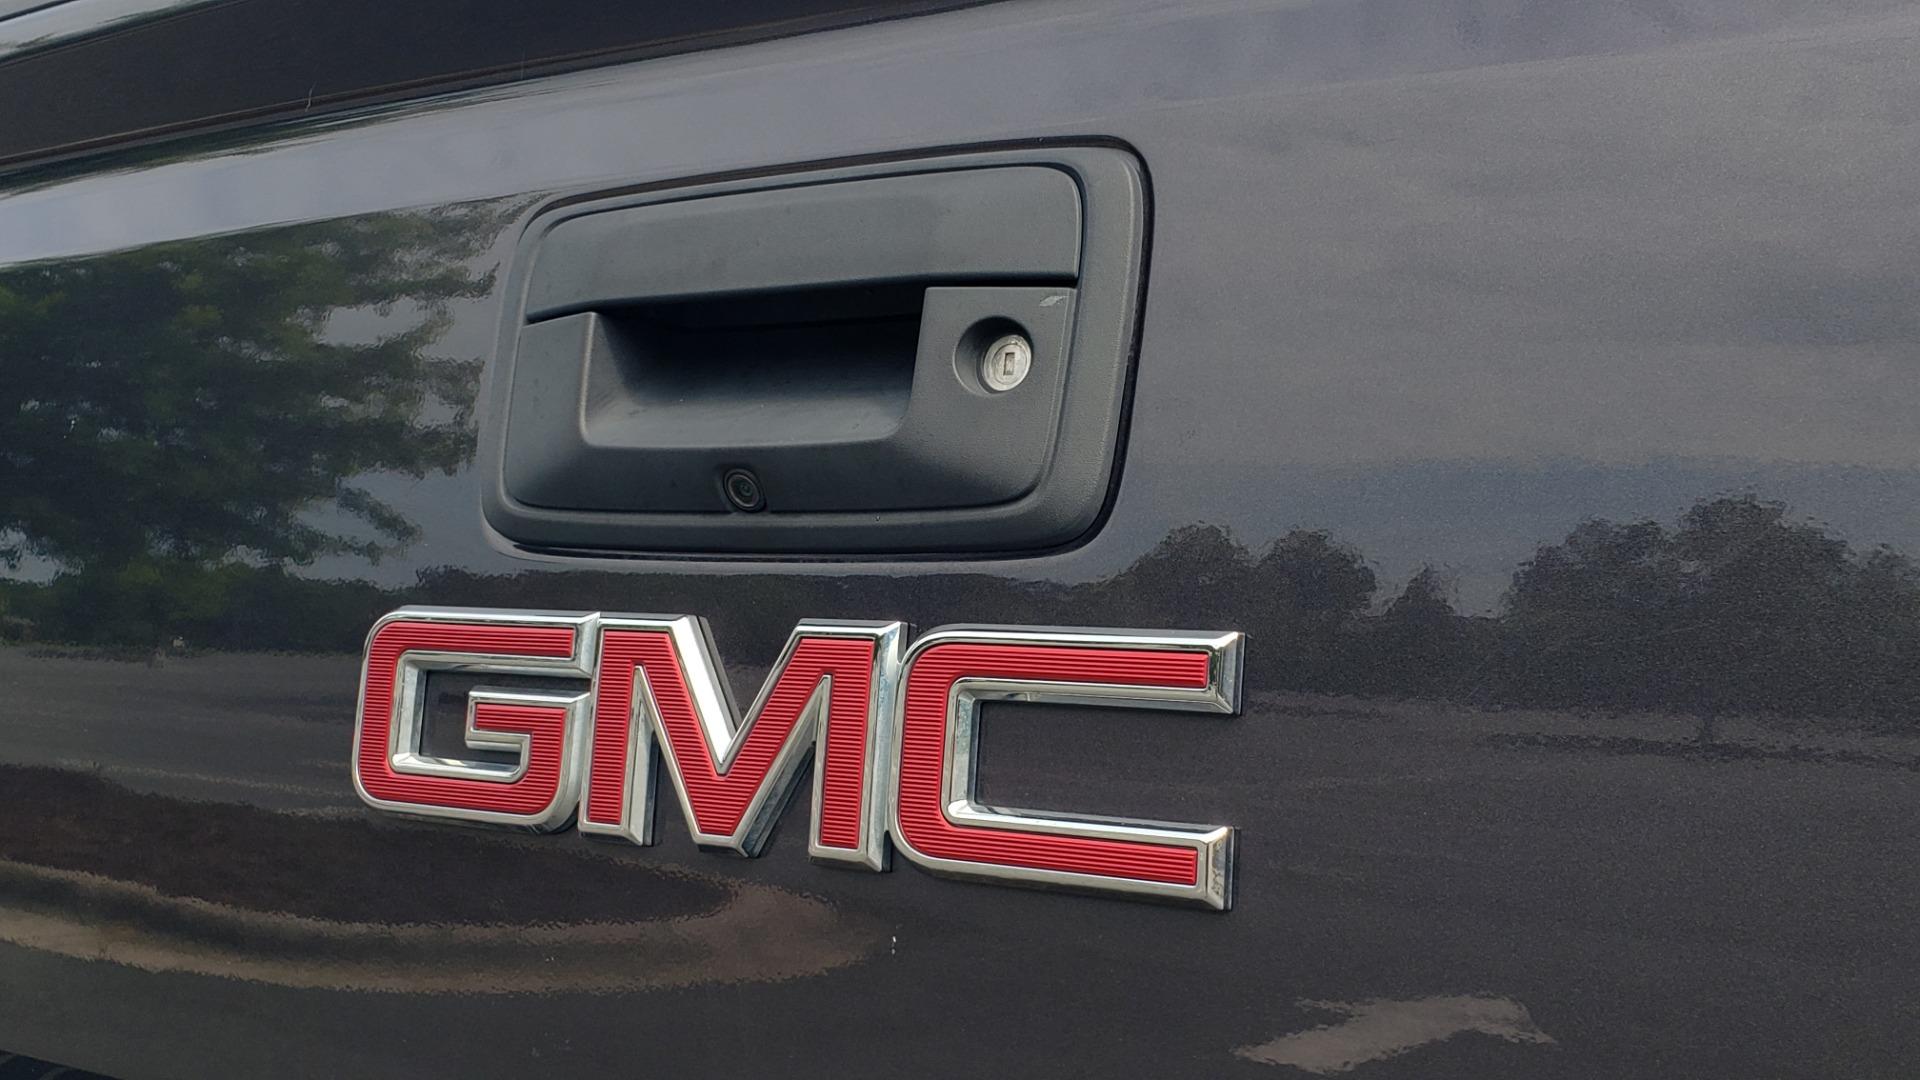 Used 2015 GMC SIERRA 2500HD DENALI / WIFI / NAV / DURAMAX PLUS / DRVR ALERT / SUNROOF / REARVIEW for sale $56,995 at Formula Imports in Charlotte NC 28227 26